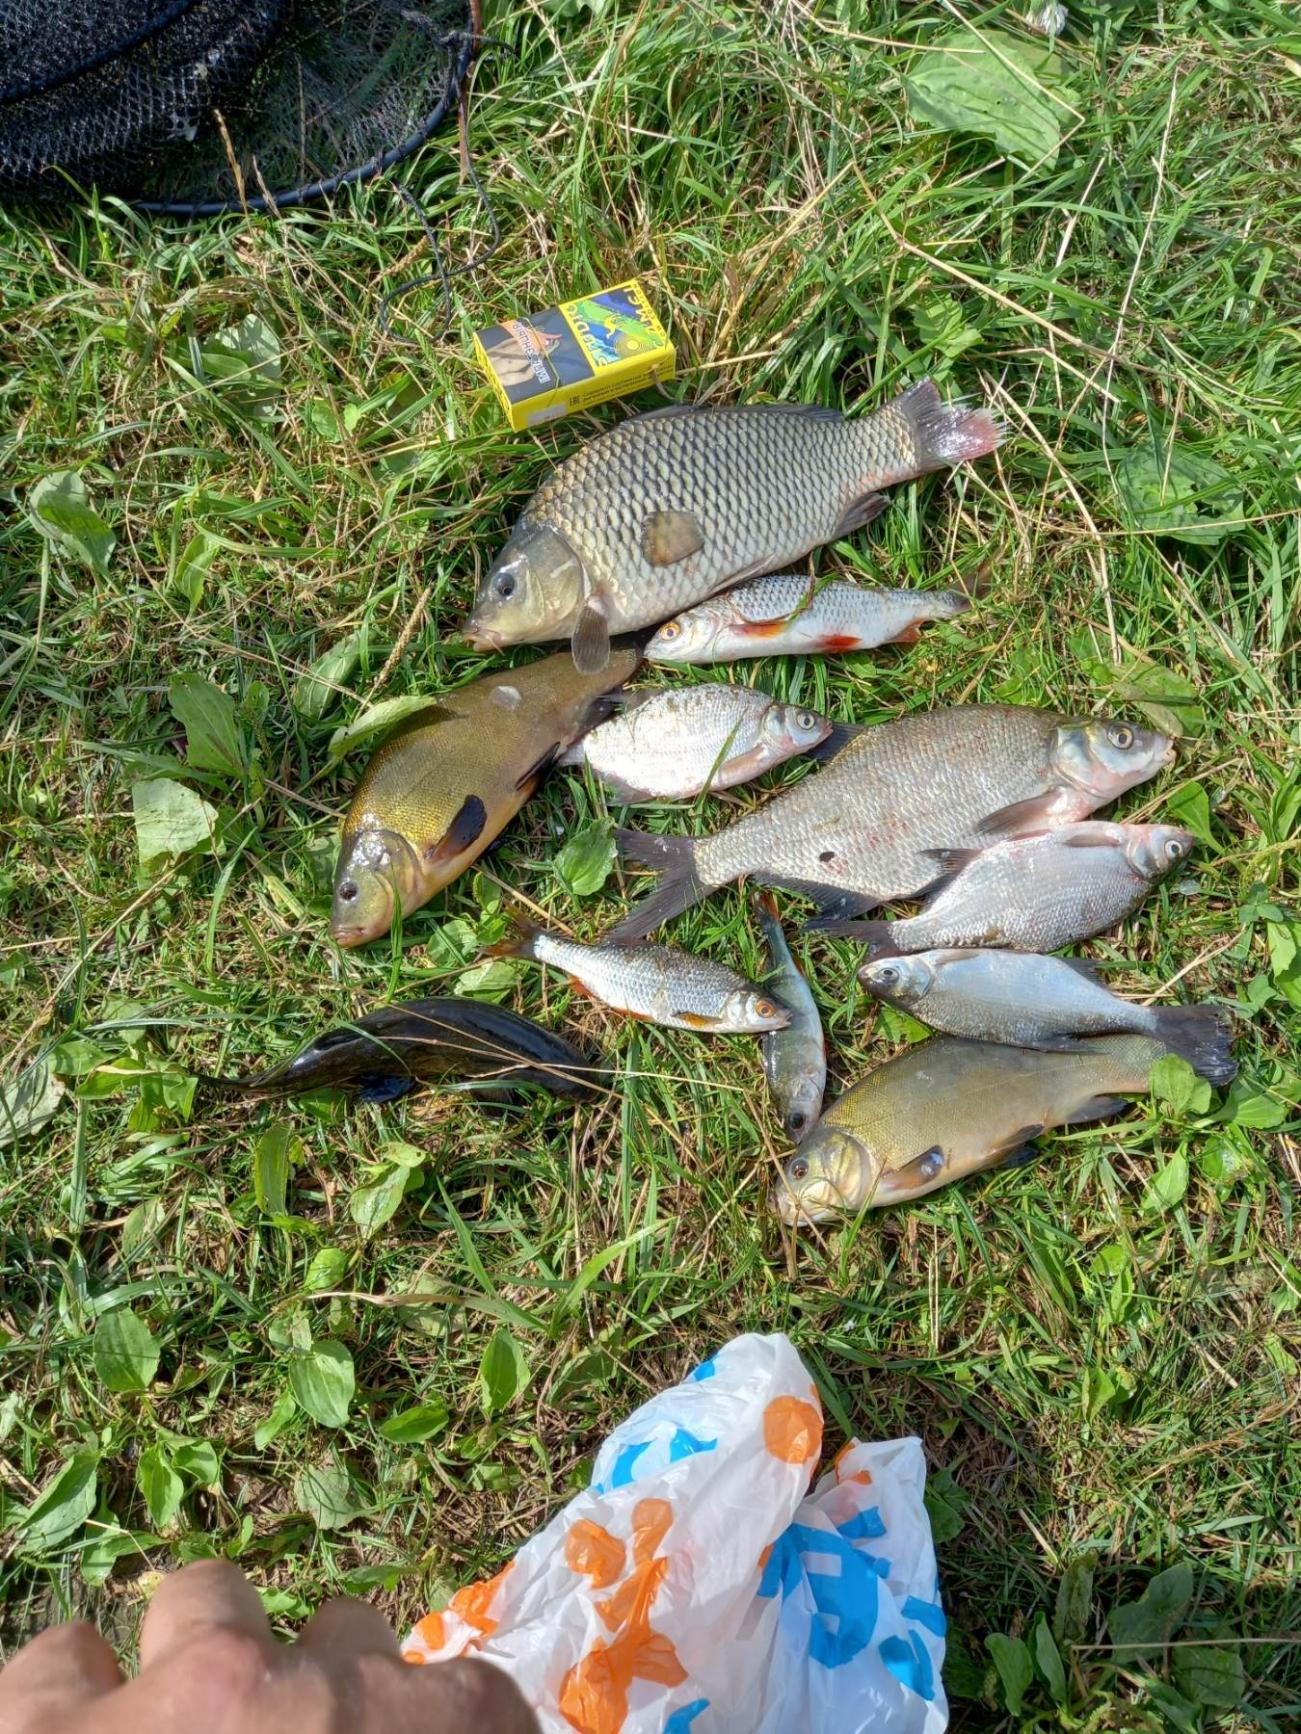 Ночь с пт на сб. Настраивался на леща ... | Отчеты о рыбалке в Беларуси